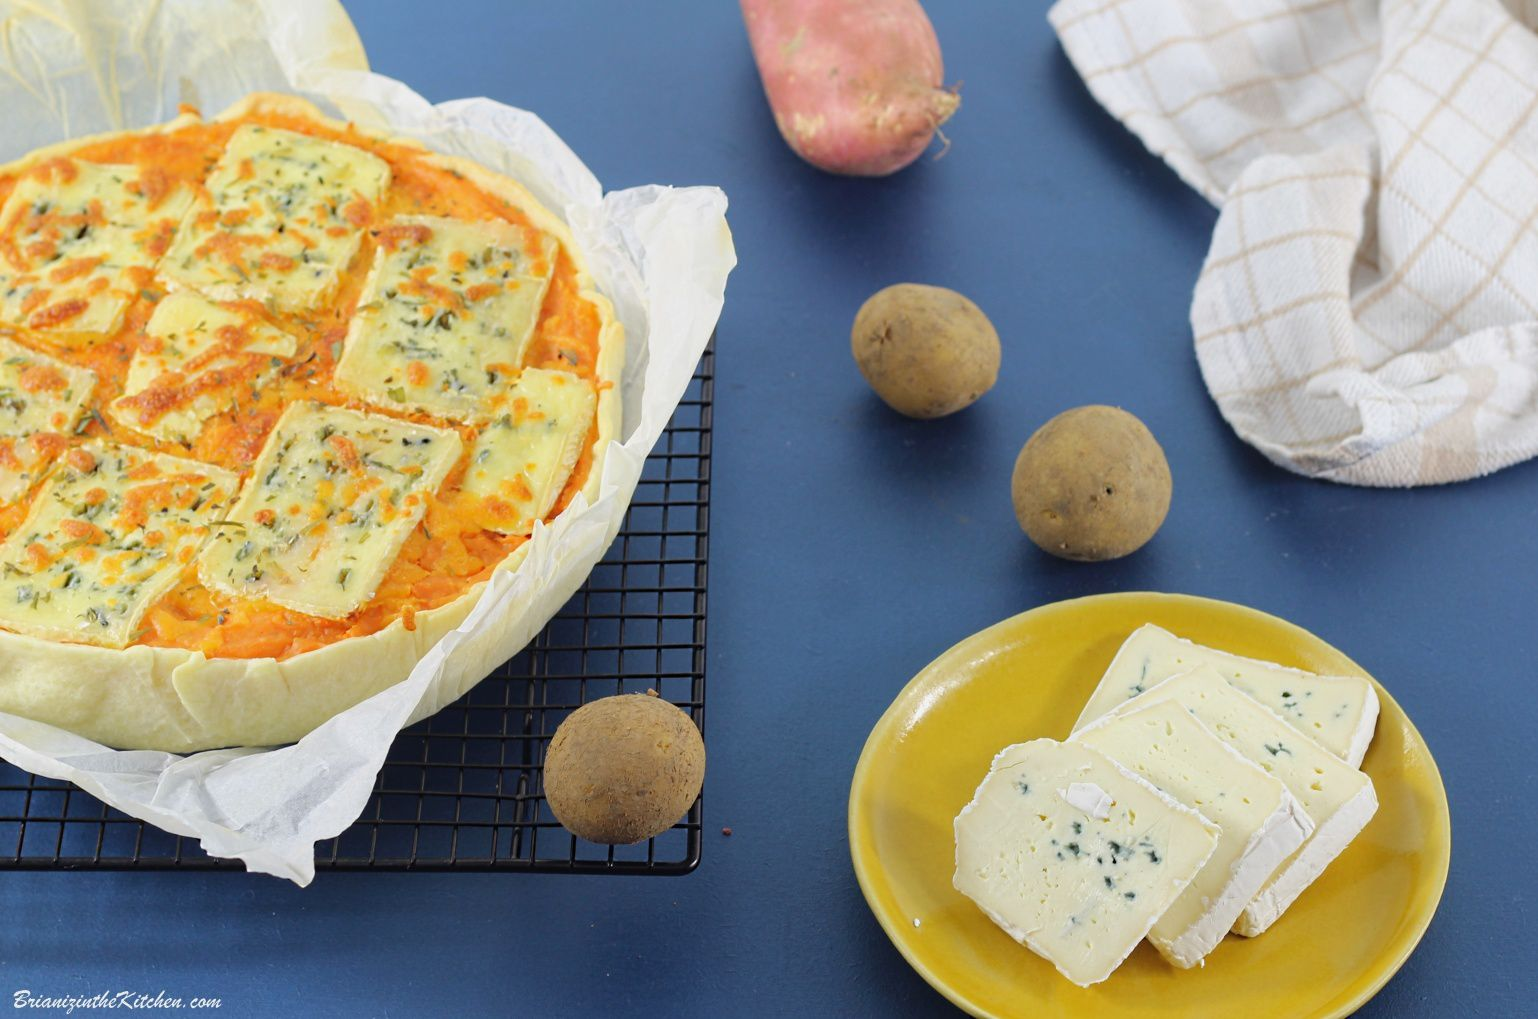 Tart'Hachis Patates Douces et Bleu